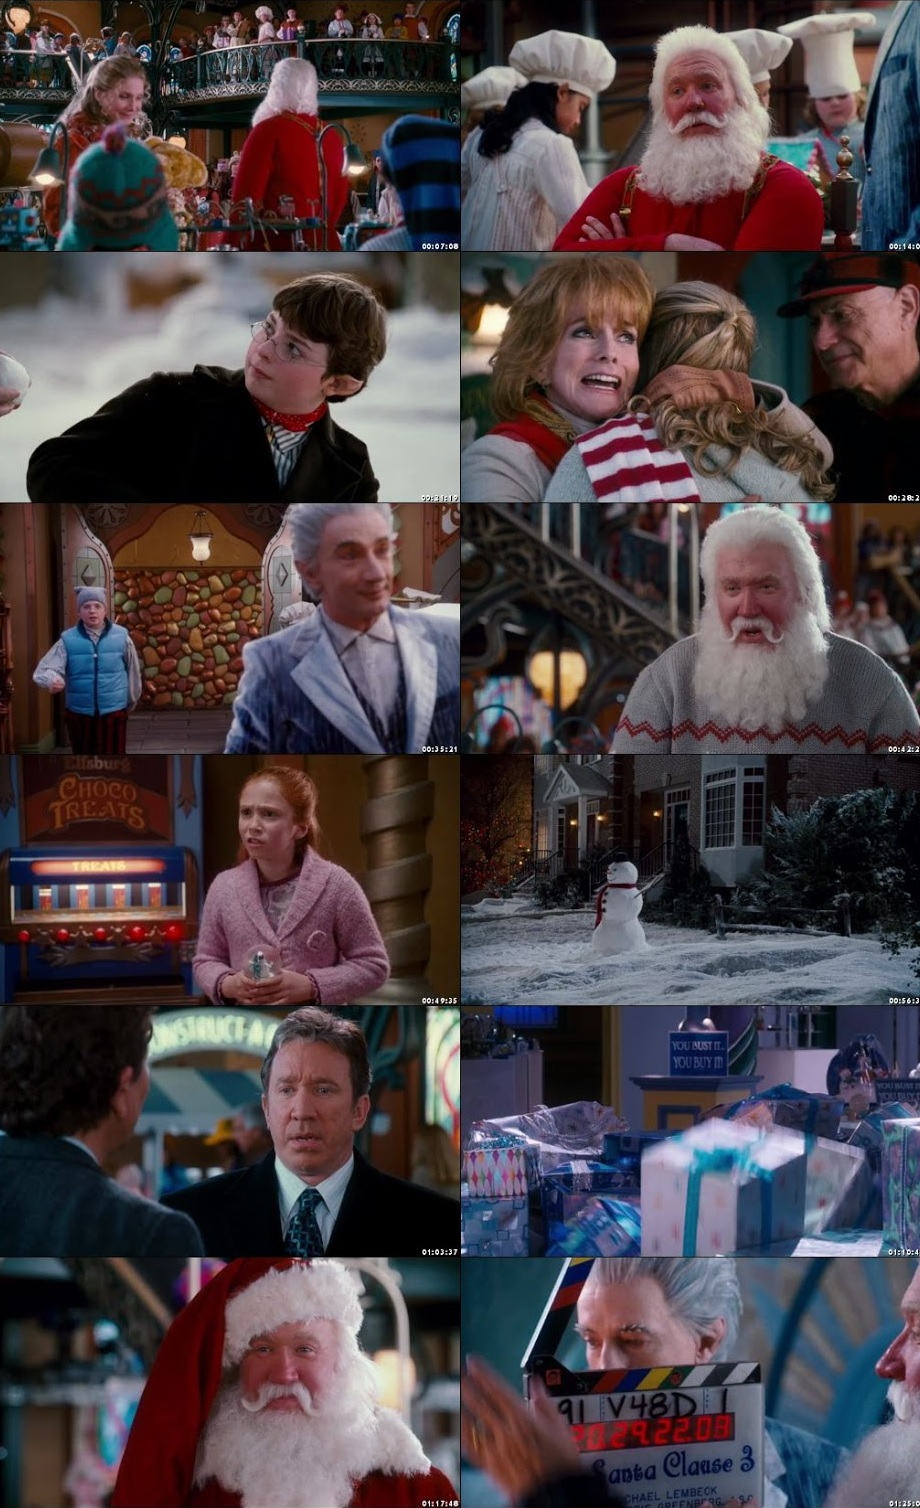 The Santa Clause 3 2006